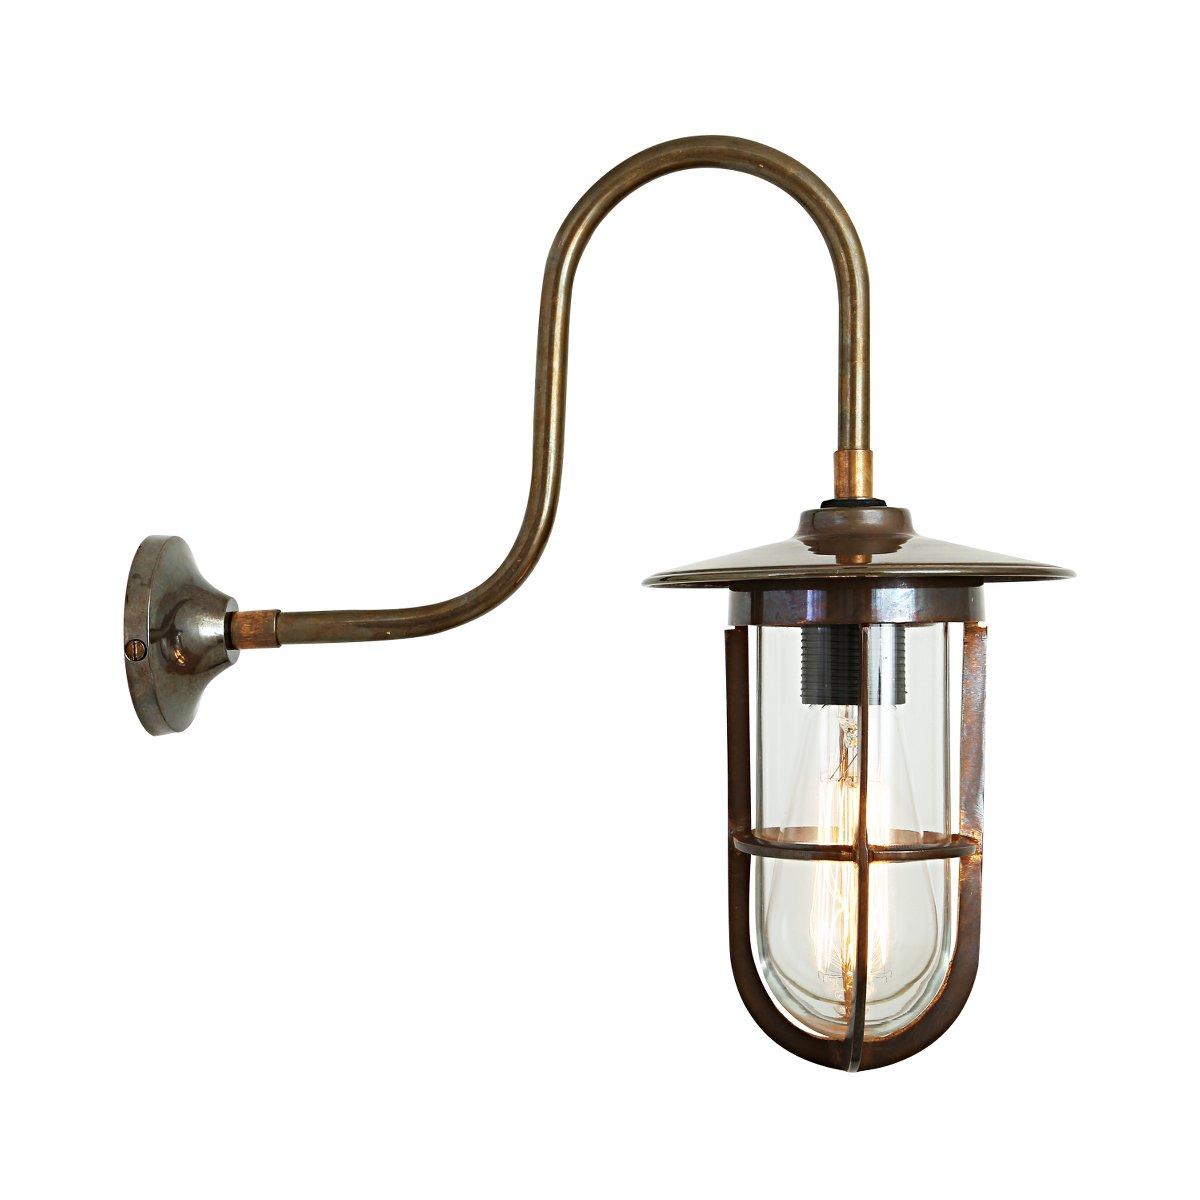 irische lampe f r au en mit vergittertem glas habo terra. Black Bedroom Furniture Sets. Home Design Ideas